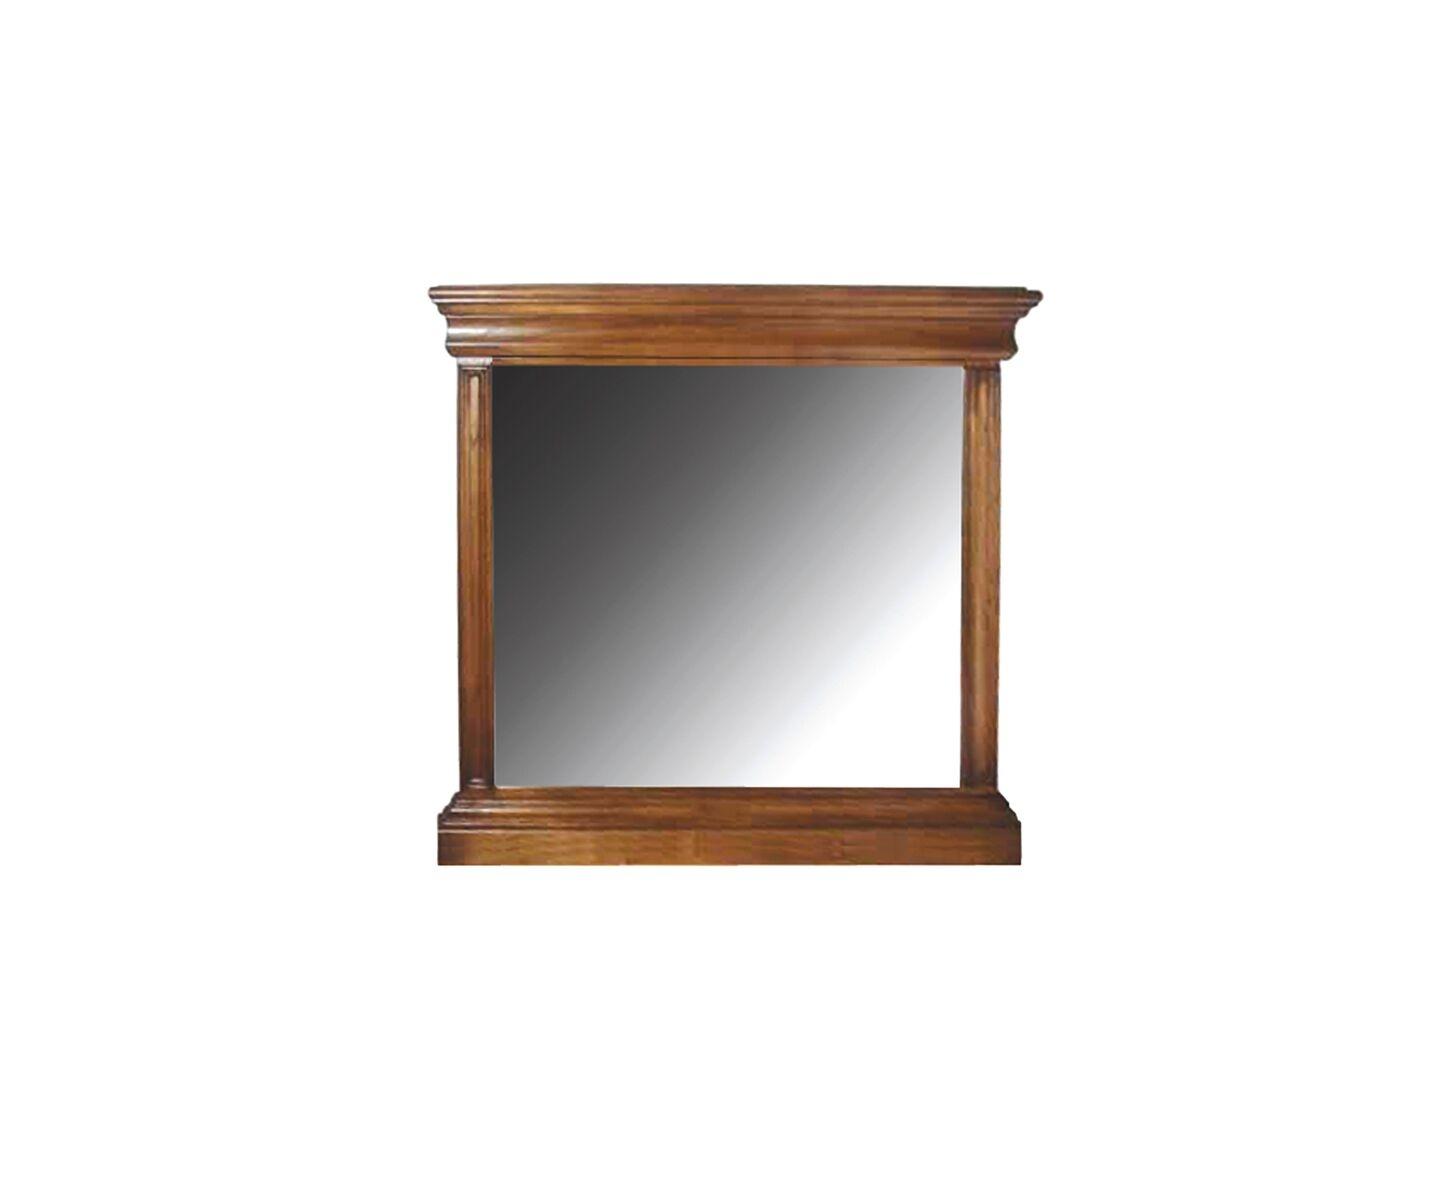 Oglinda decorativa din lemn de stejar Valentino Oak l118xA75xH118 cm